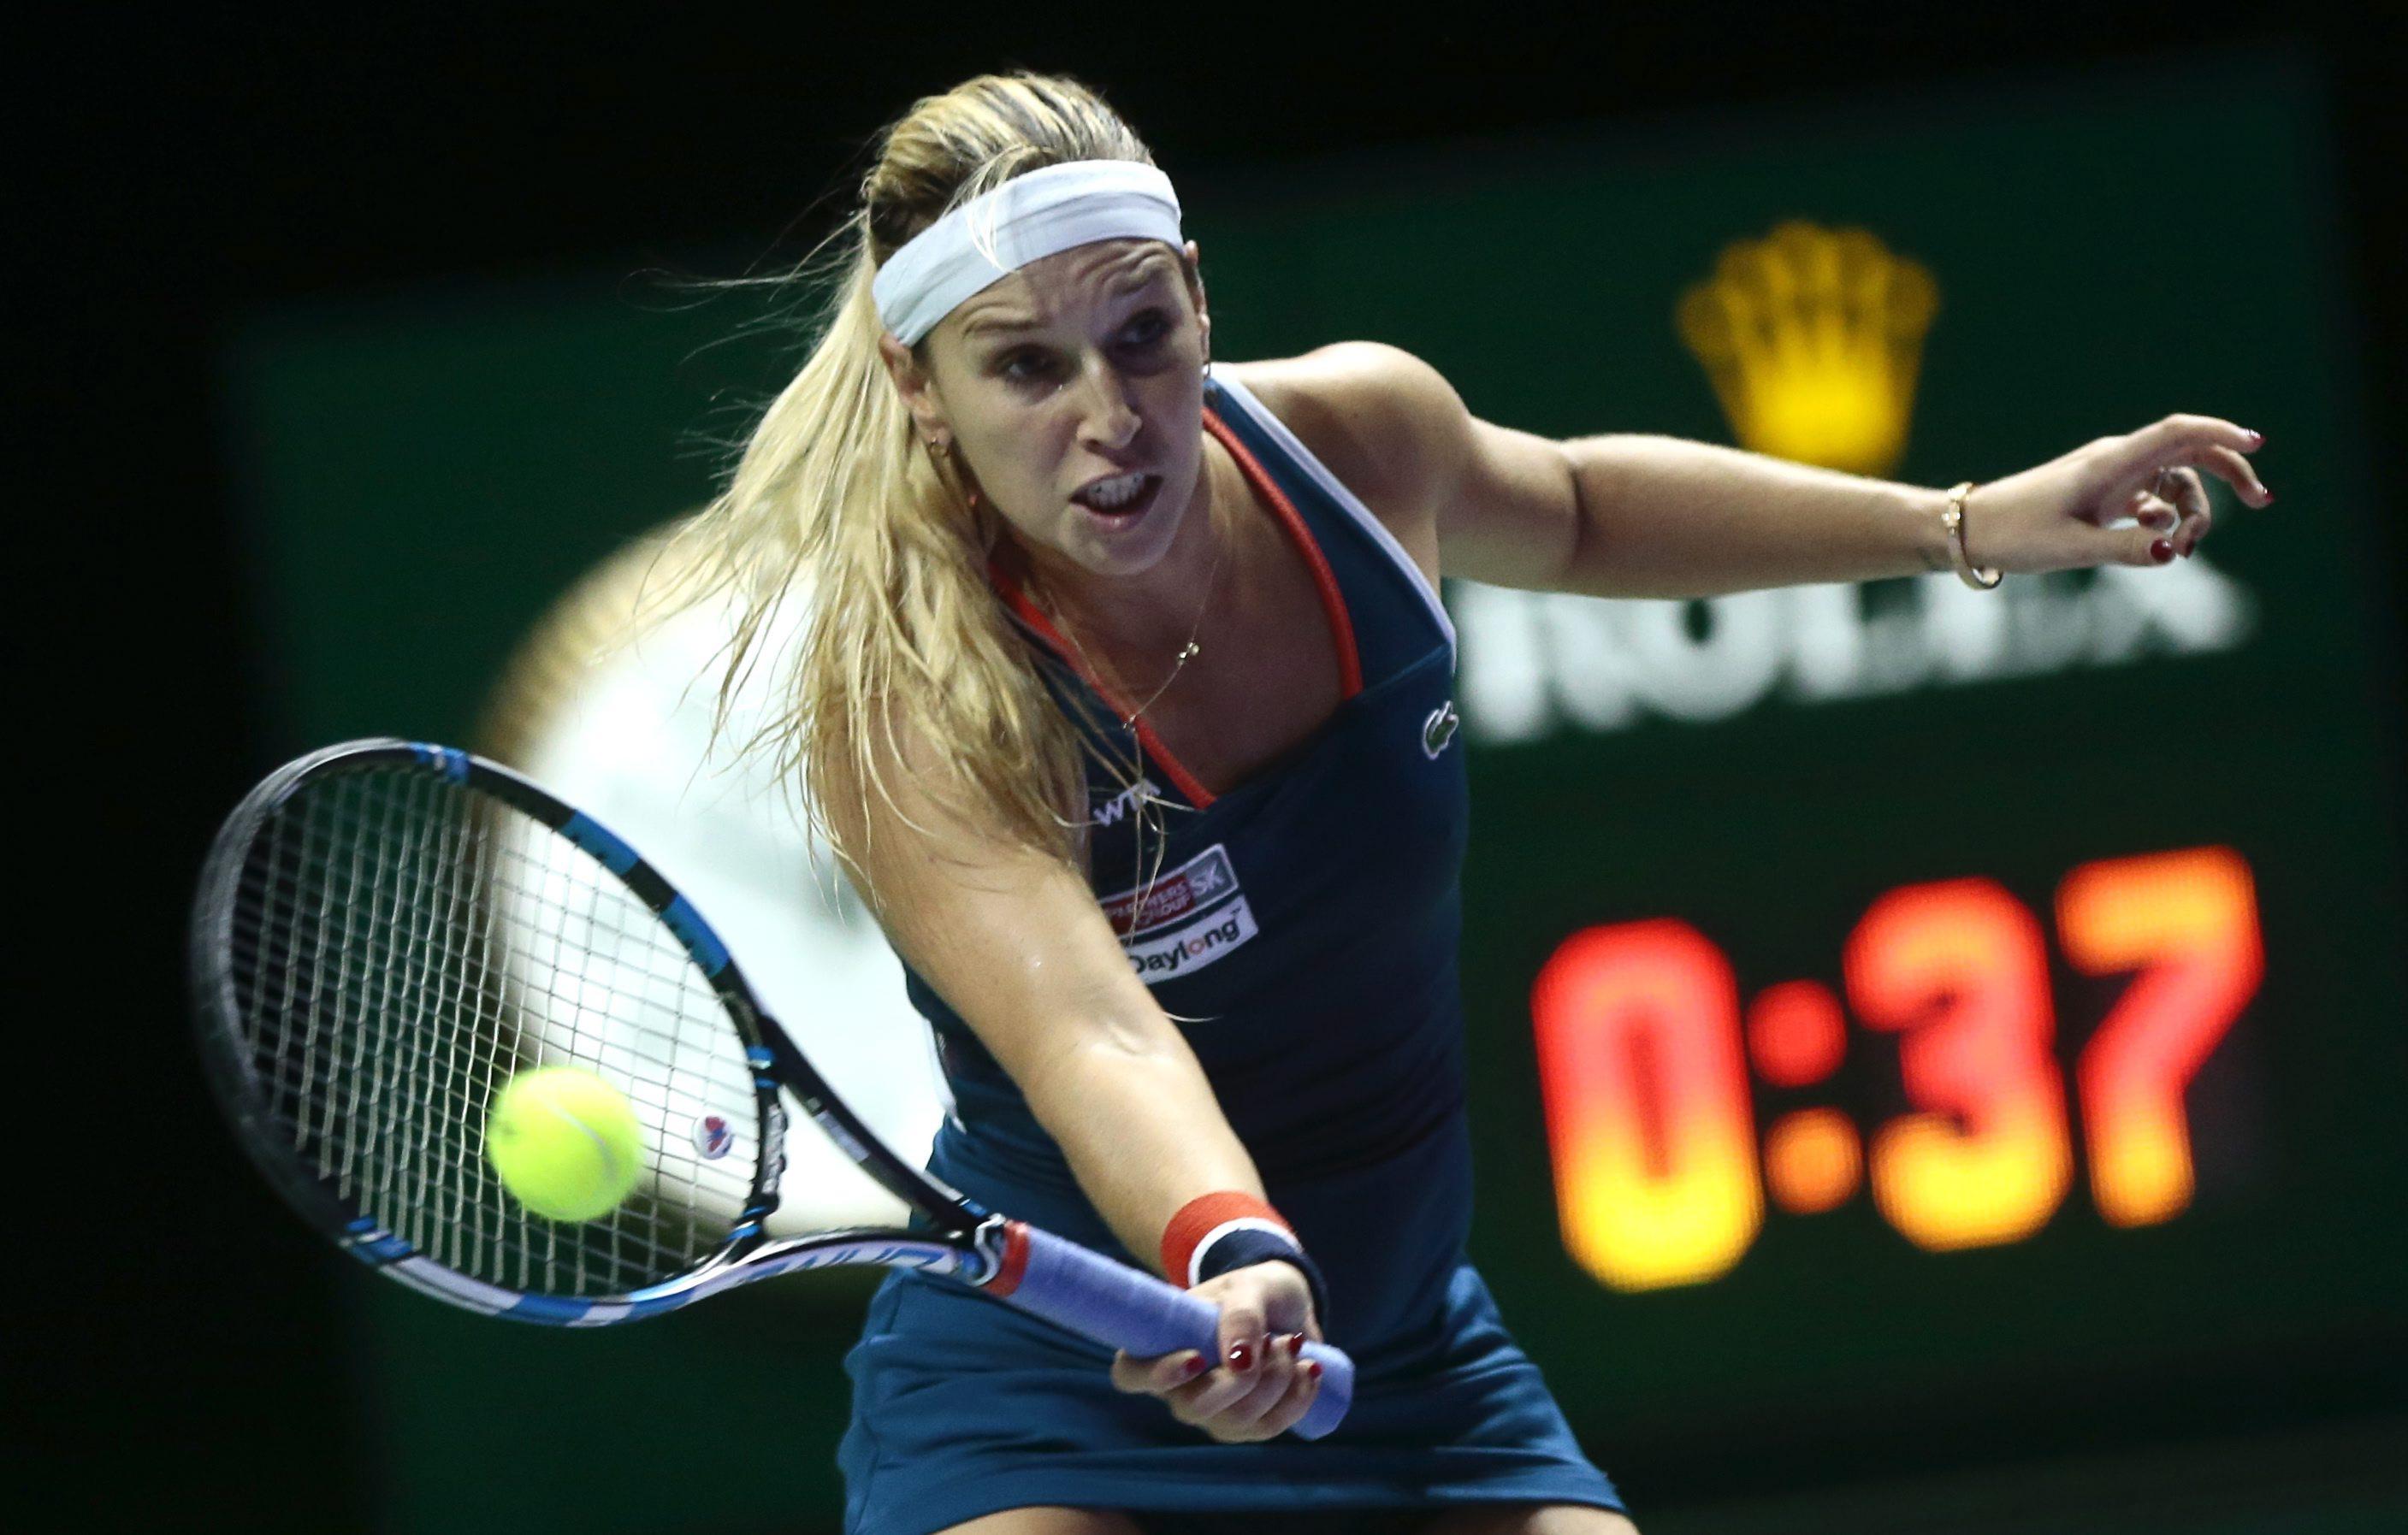 Tennis - Brad Gilbert says Dominika Cibulkova packs a lot